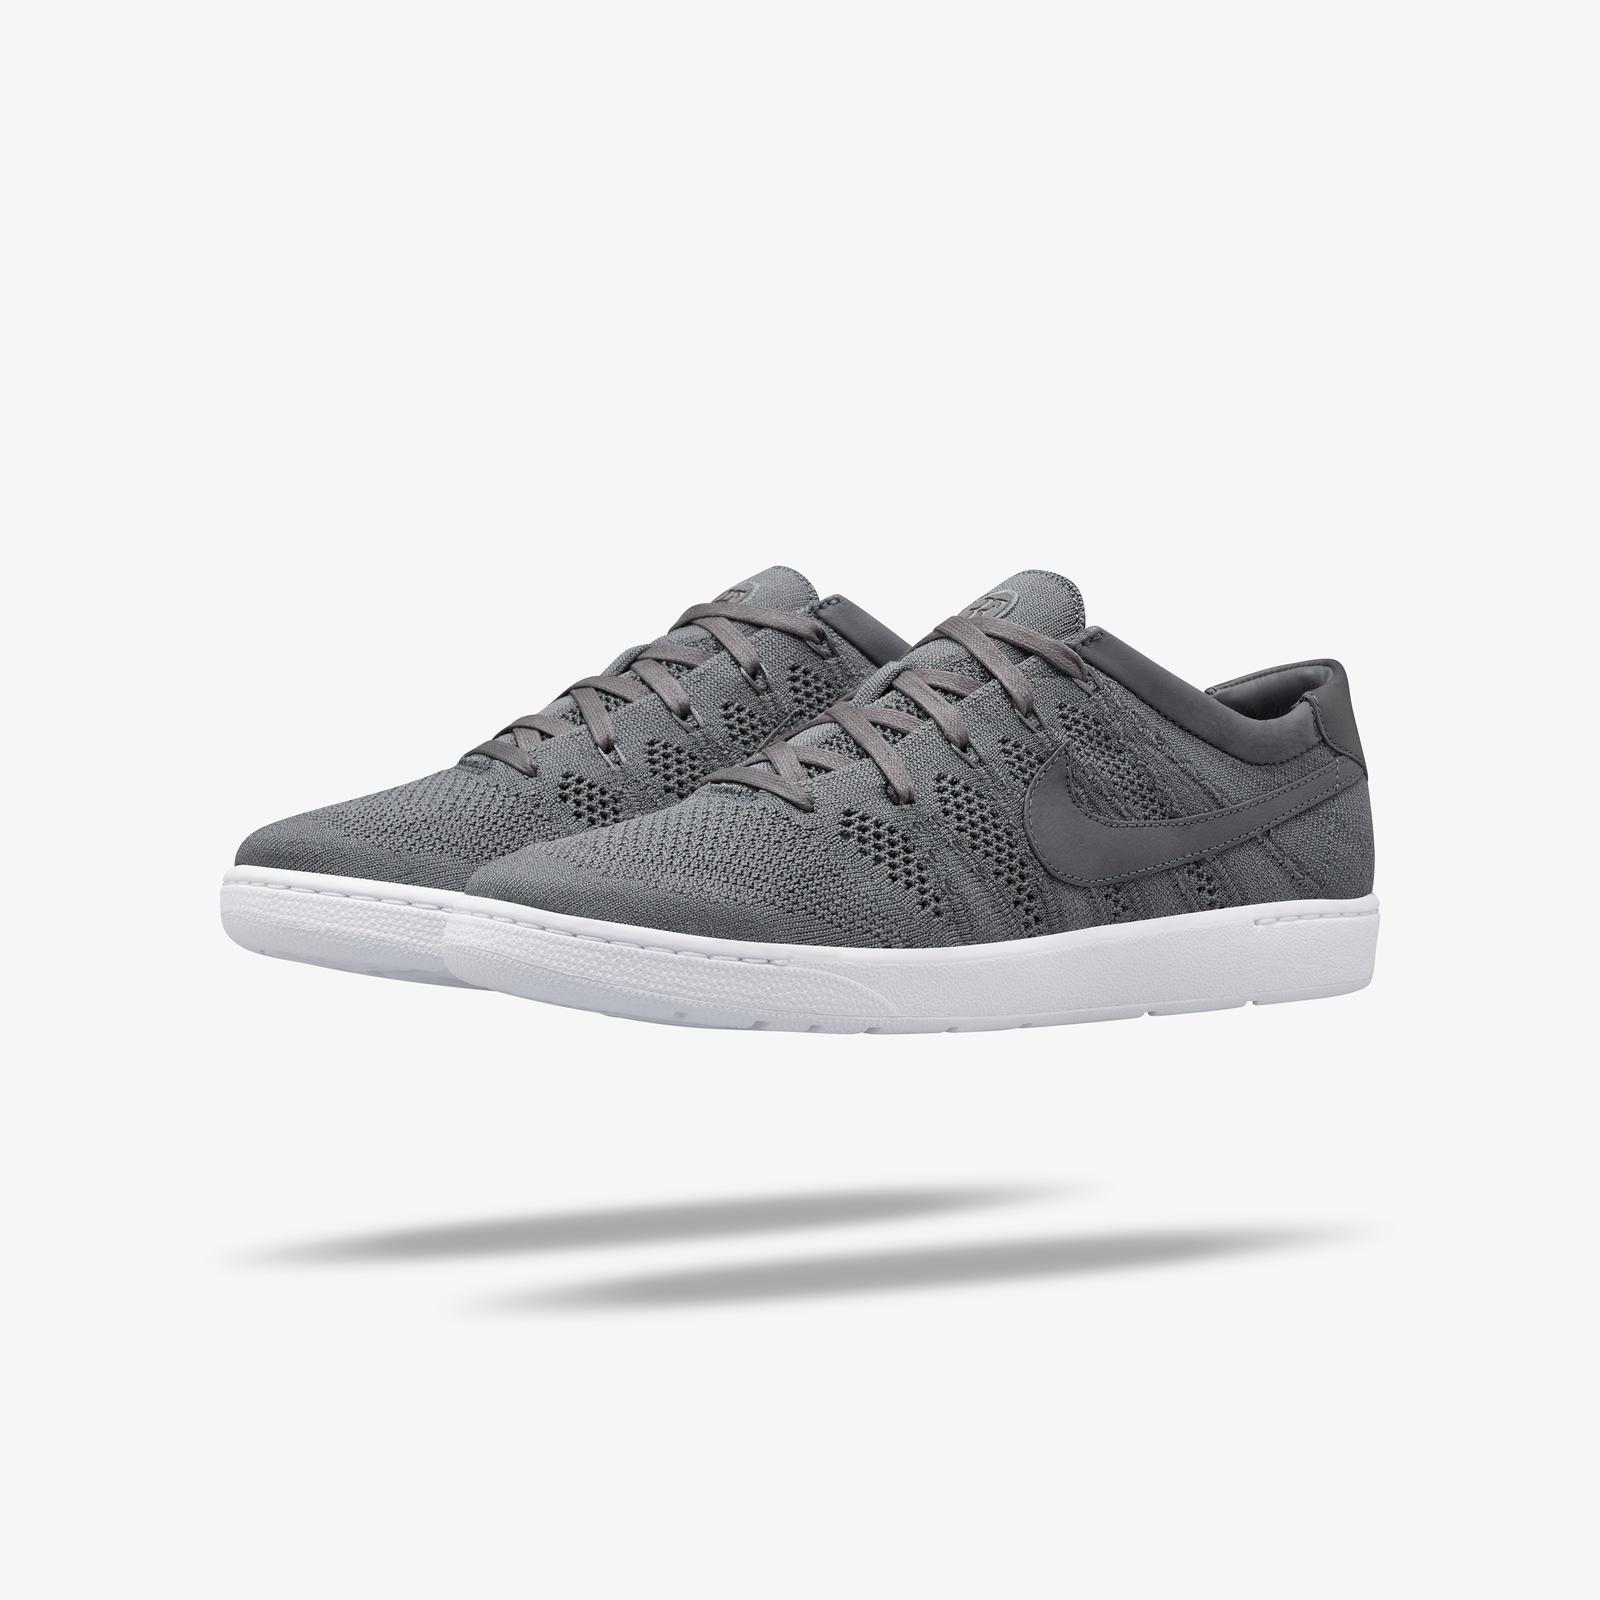 roger federer nikecourt 2016 shoes